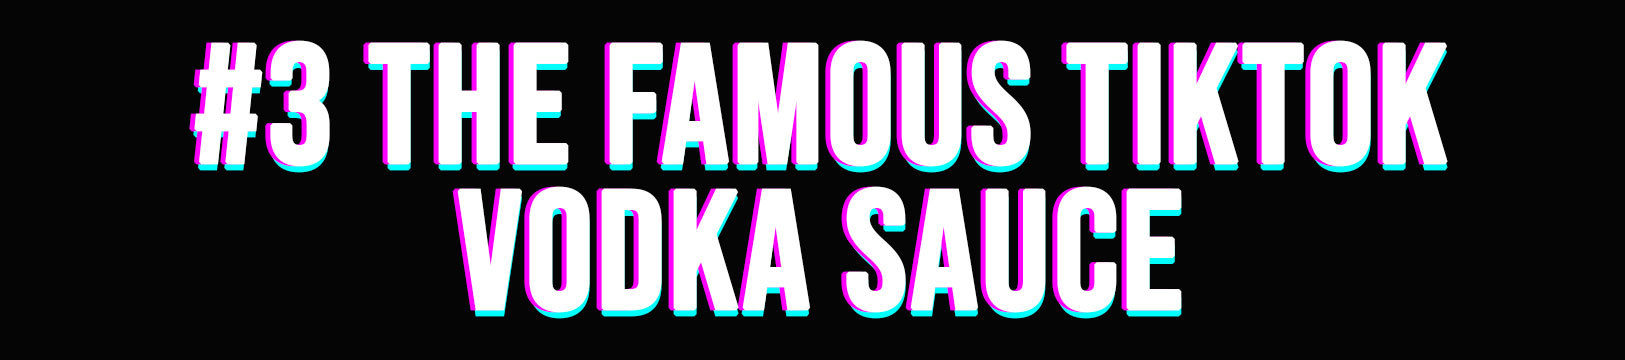 #3 The Famous TikTok Vodka Sauce